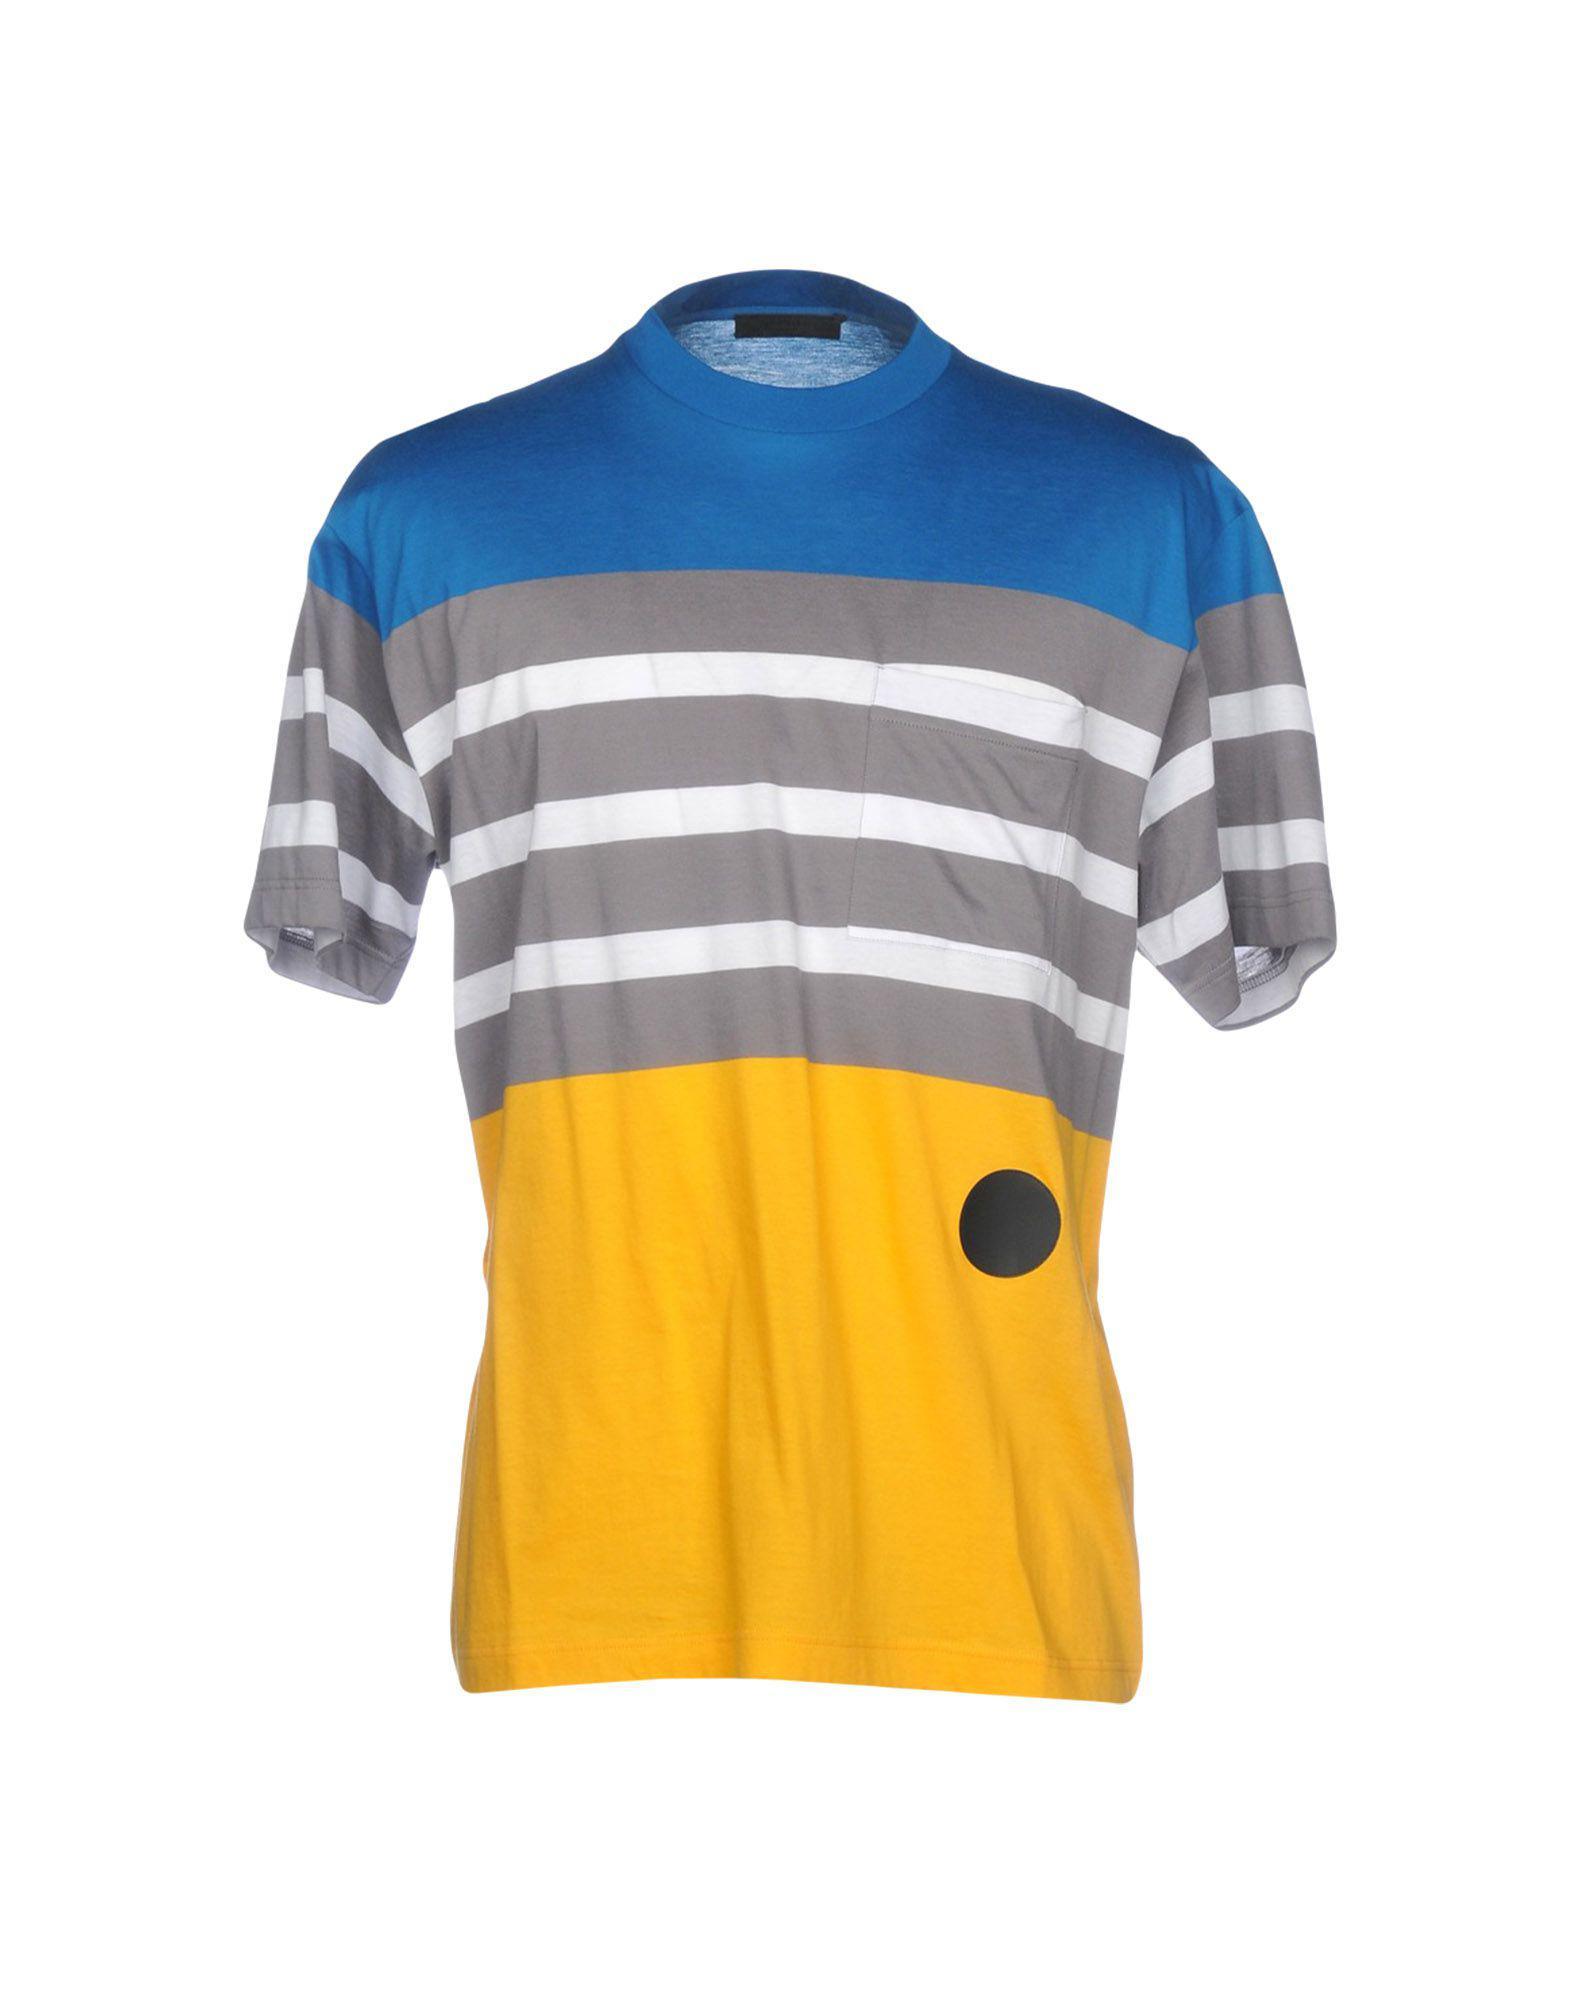 266a66a4 Mens Prada Short Sleeve T Shirt Shirts Tops - DREAMWORKS